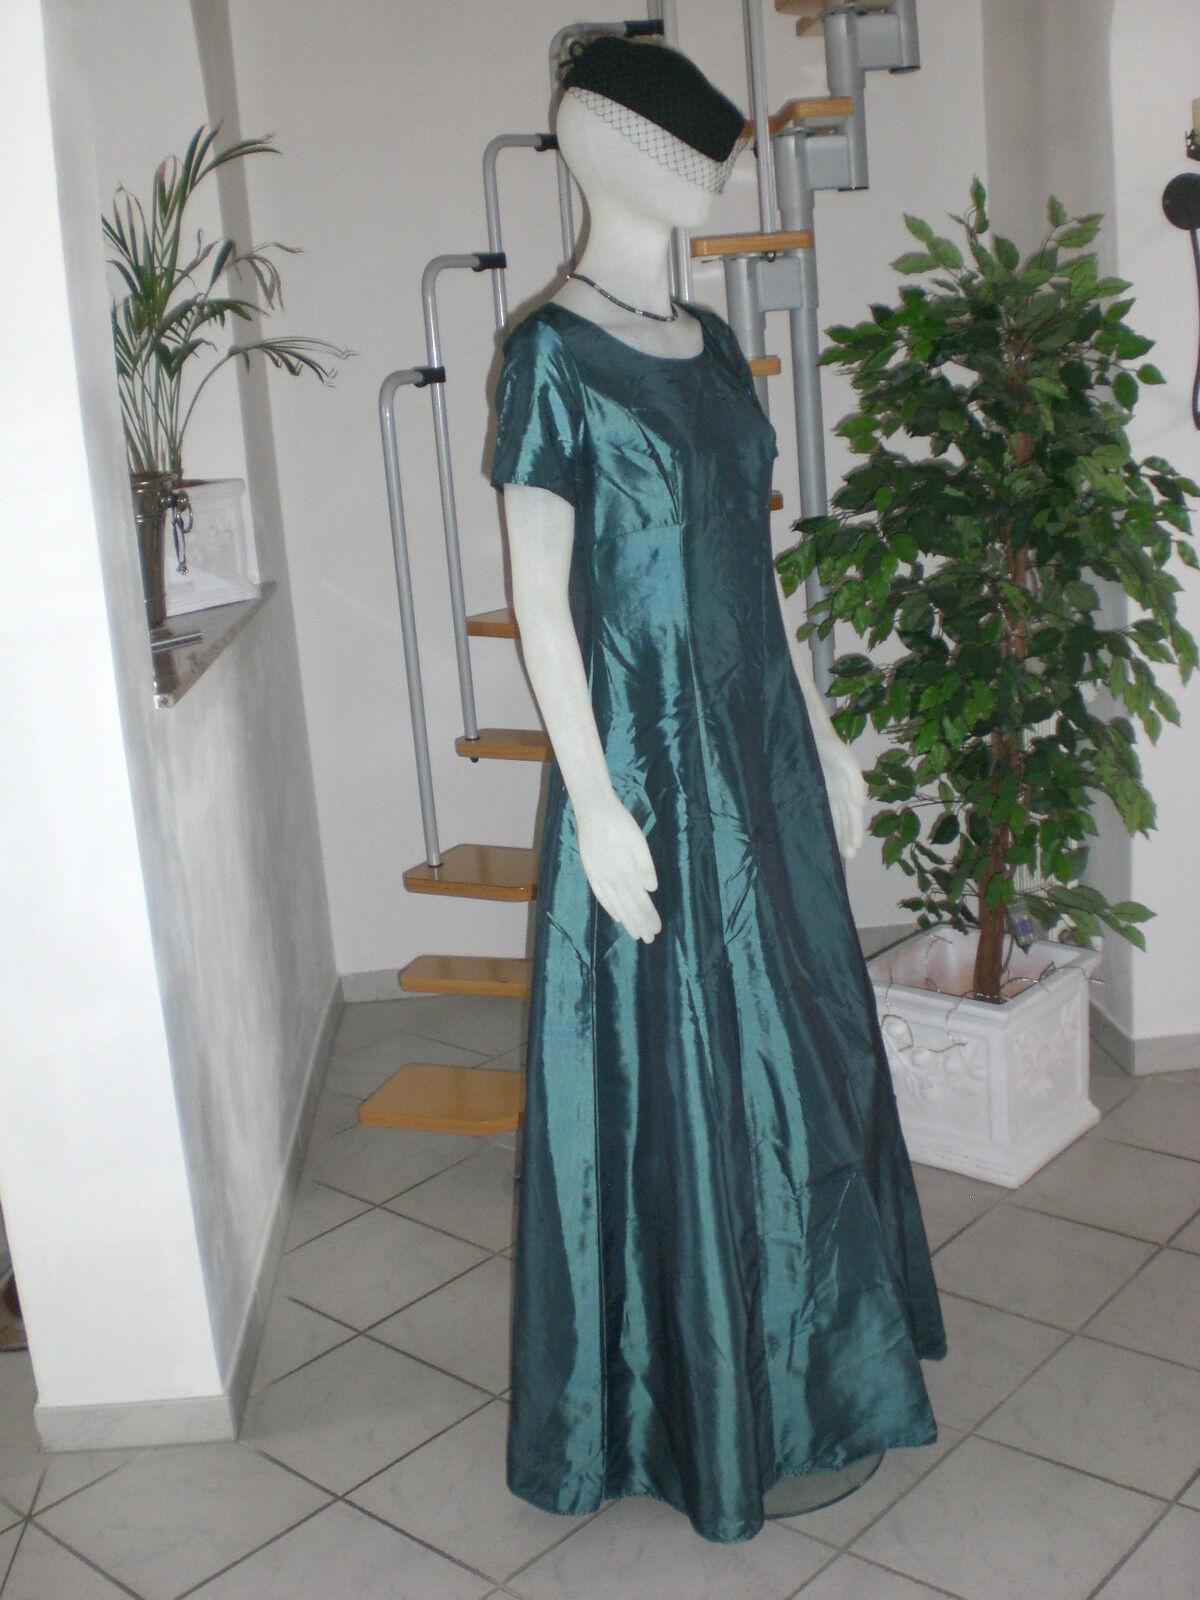 02) NEW * Elegant Ball Gown Bridal Dress Wedding Dress Vintage 38